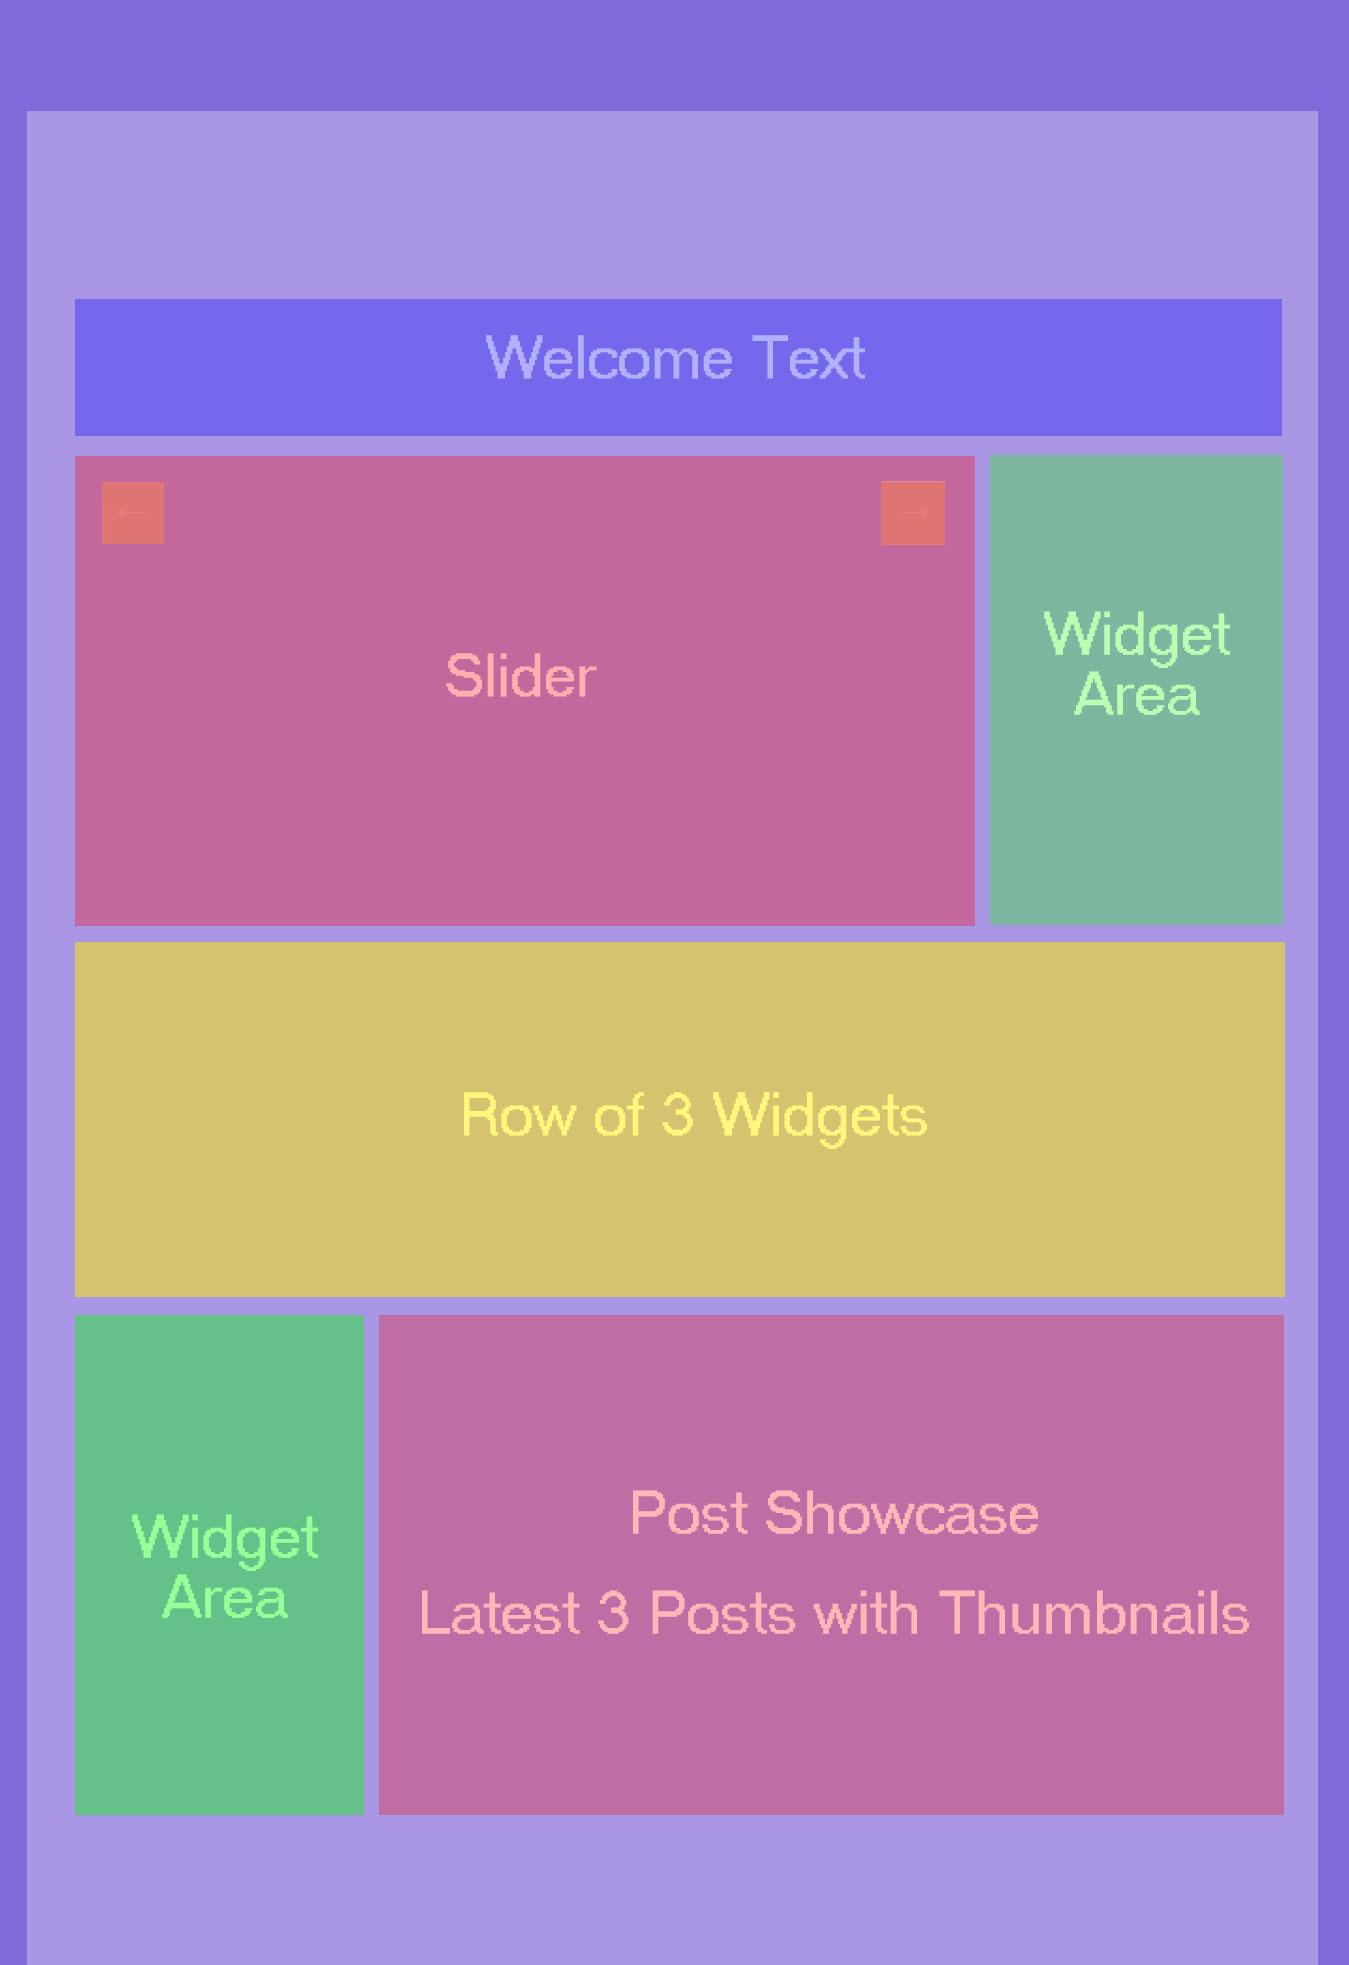 Best Reloaded - Bootstrap Theme For WordPress - PattonWebz